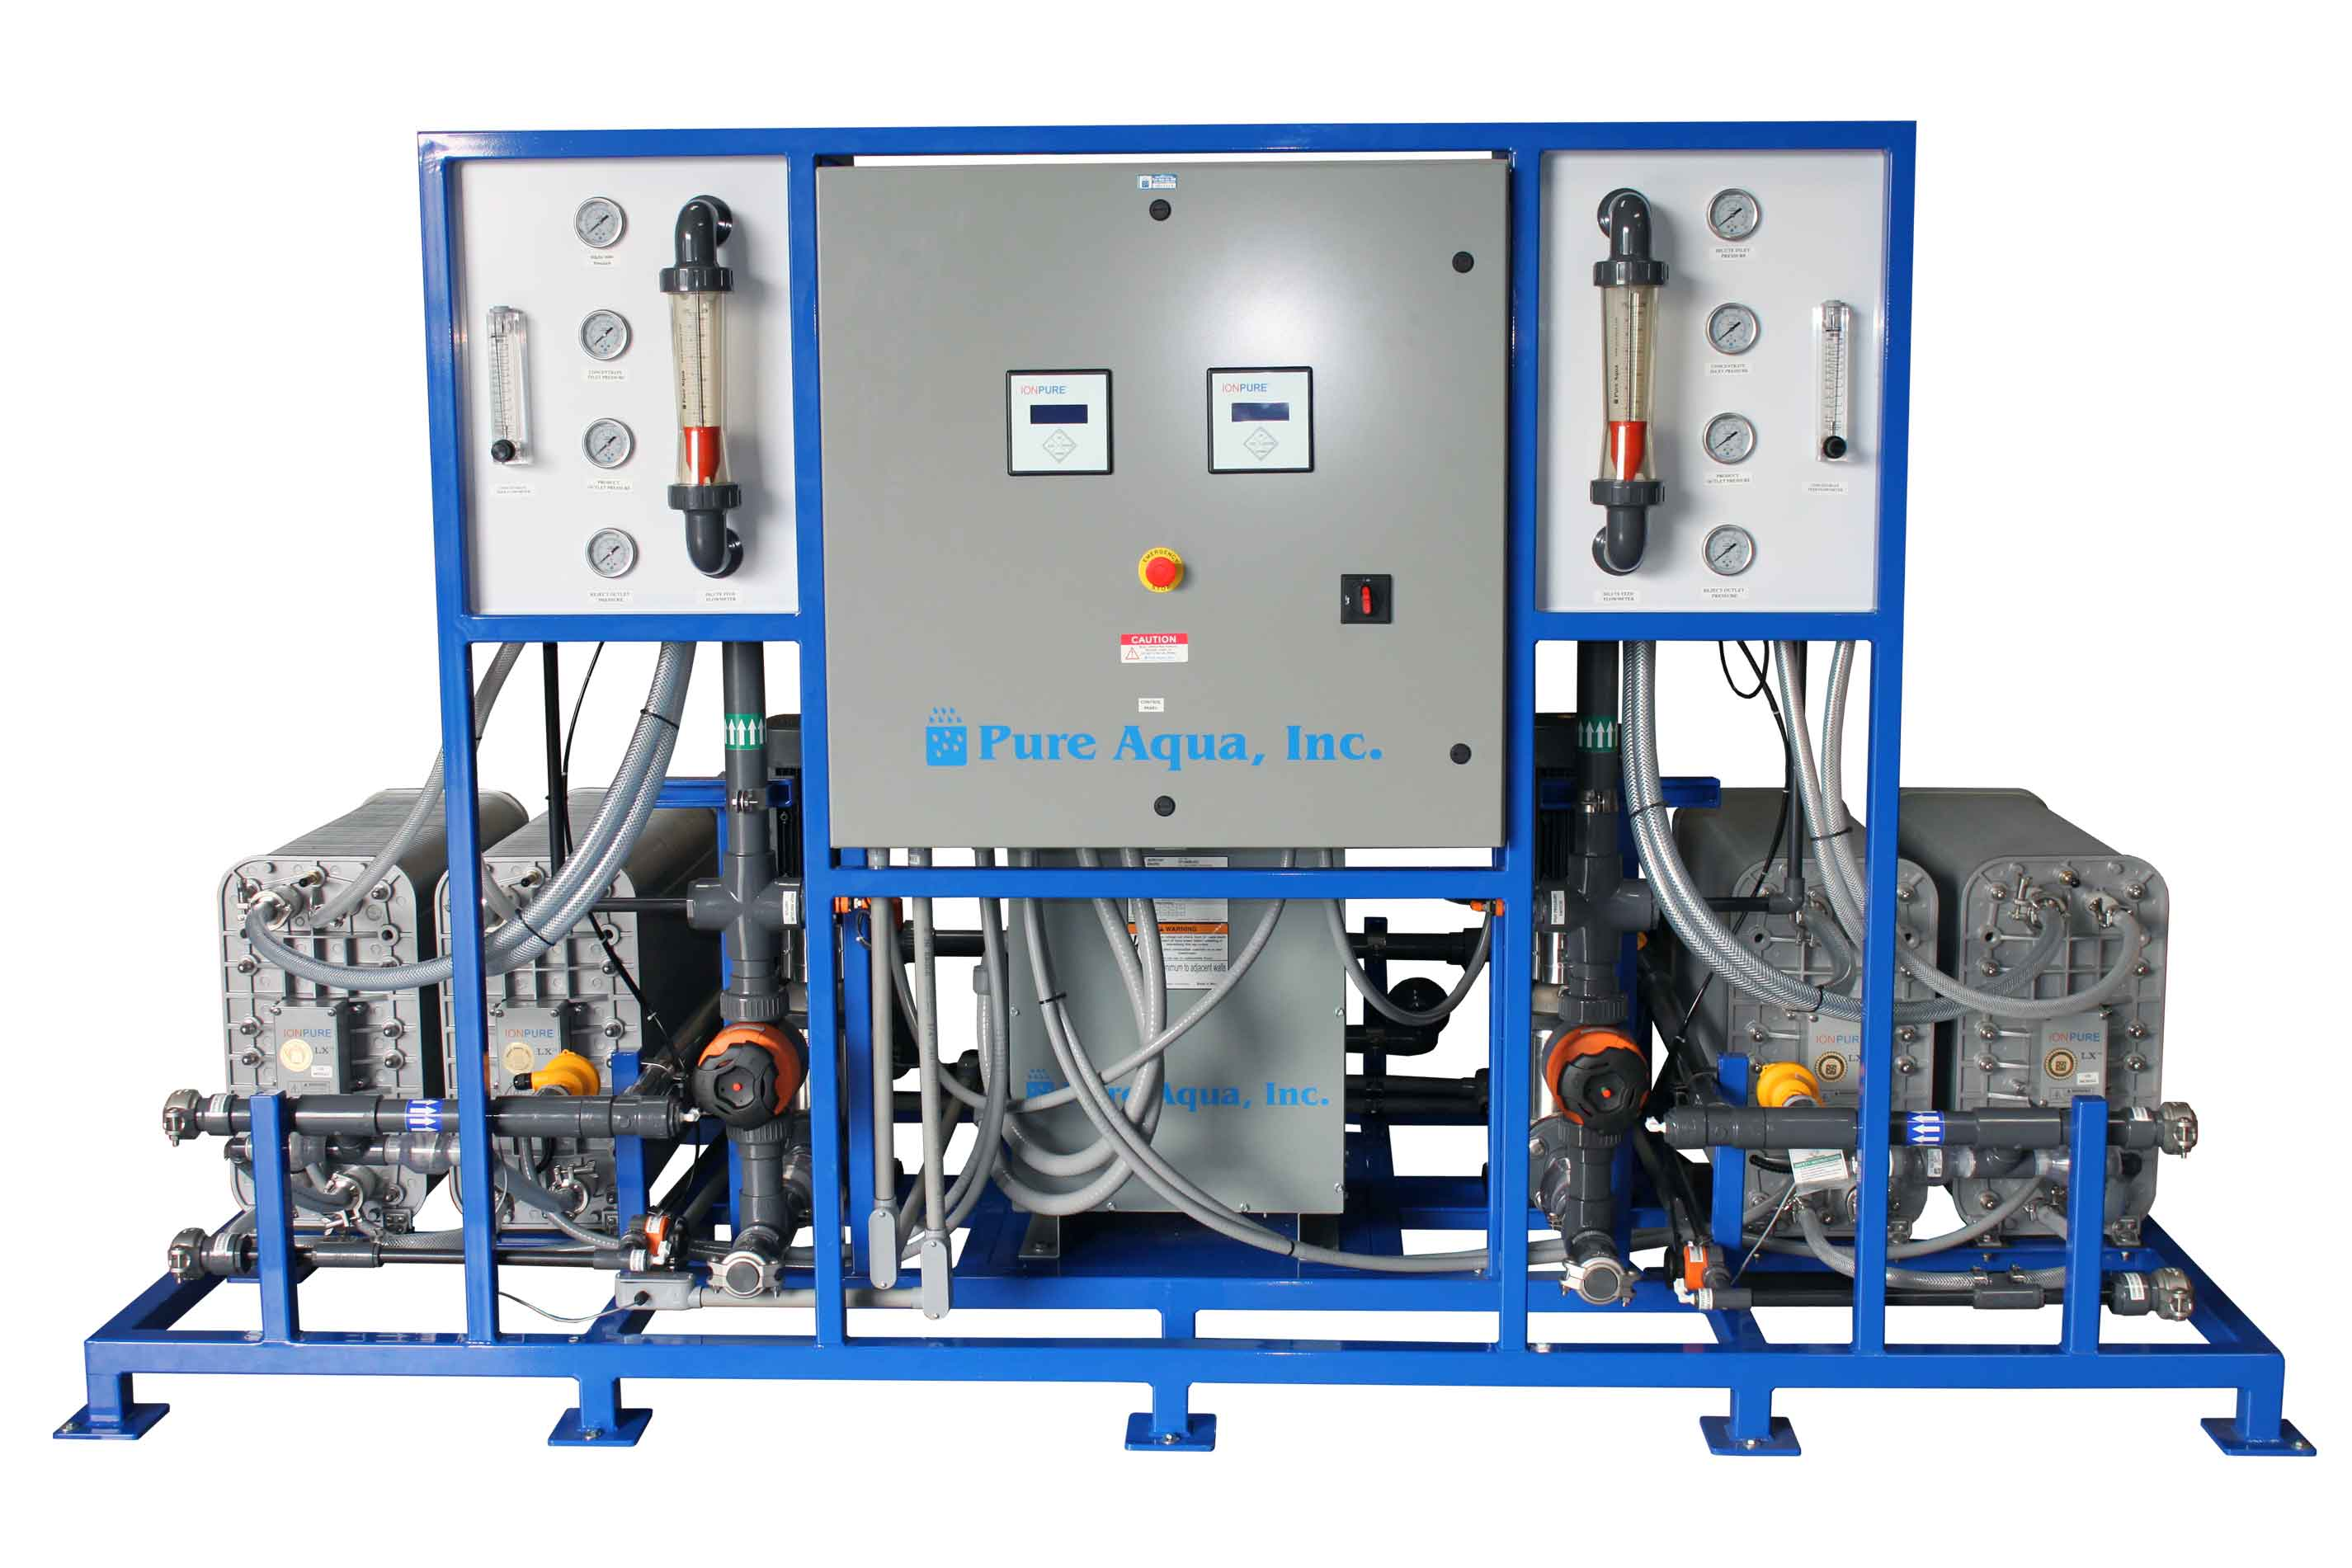 pure-aqua-edi-electrodeionization-systems.jpg